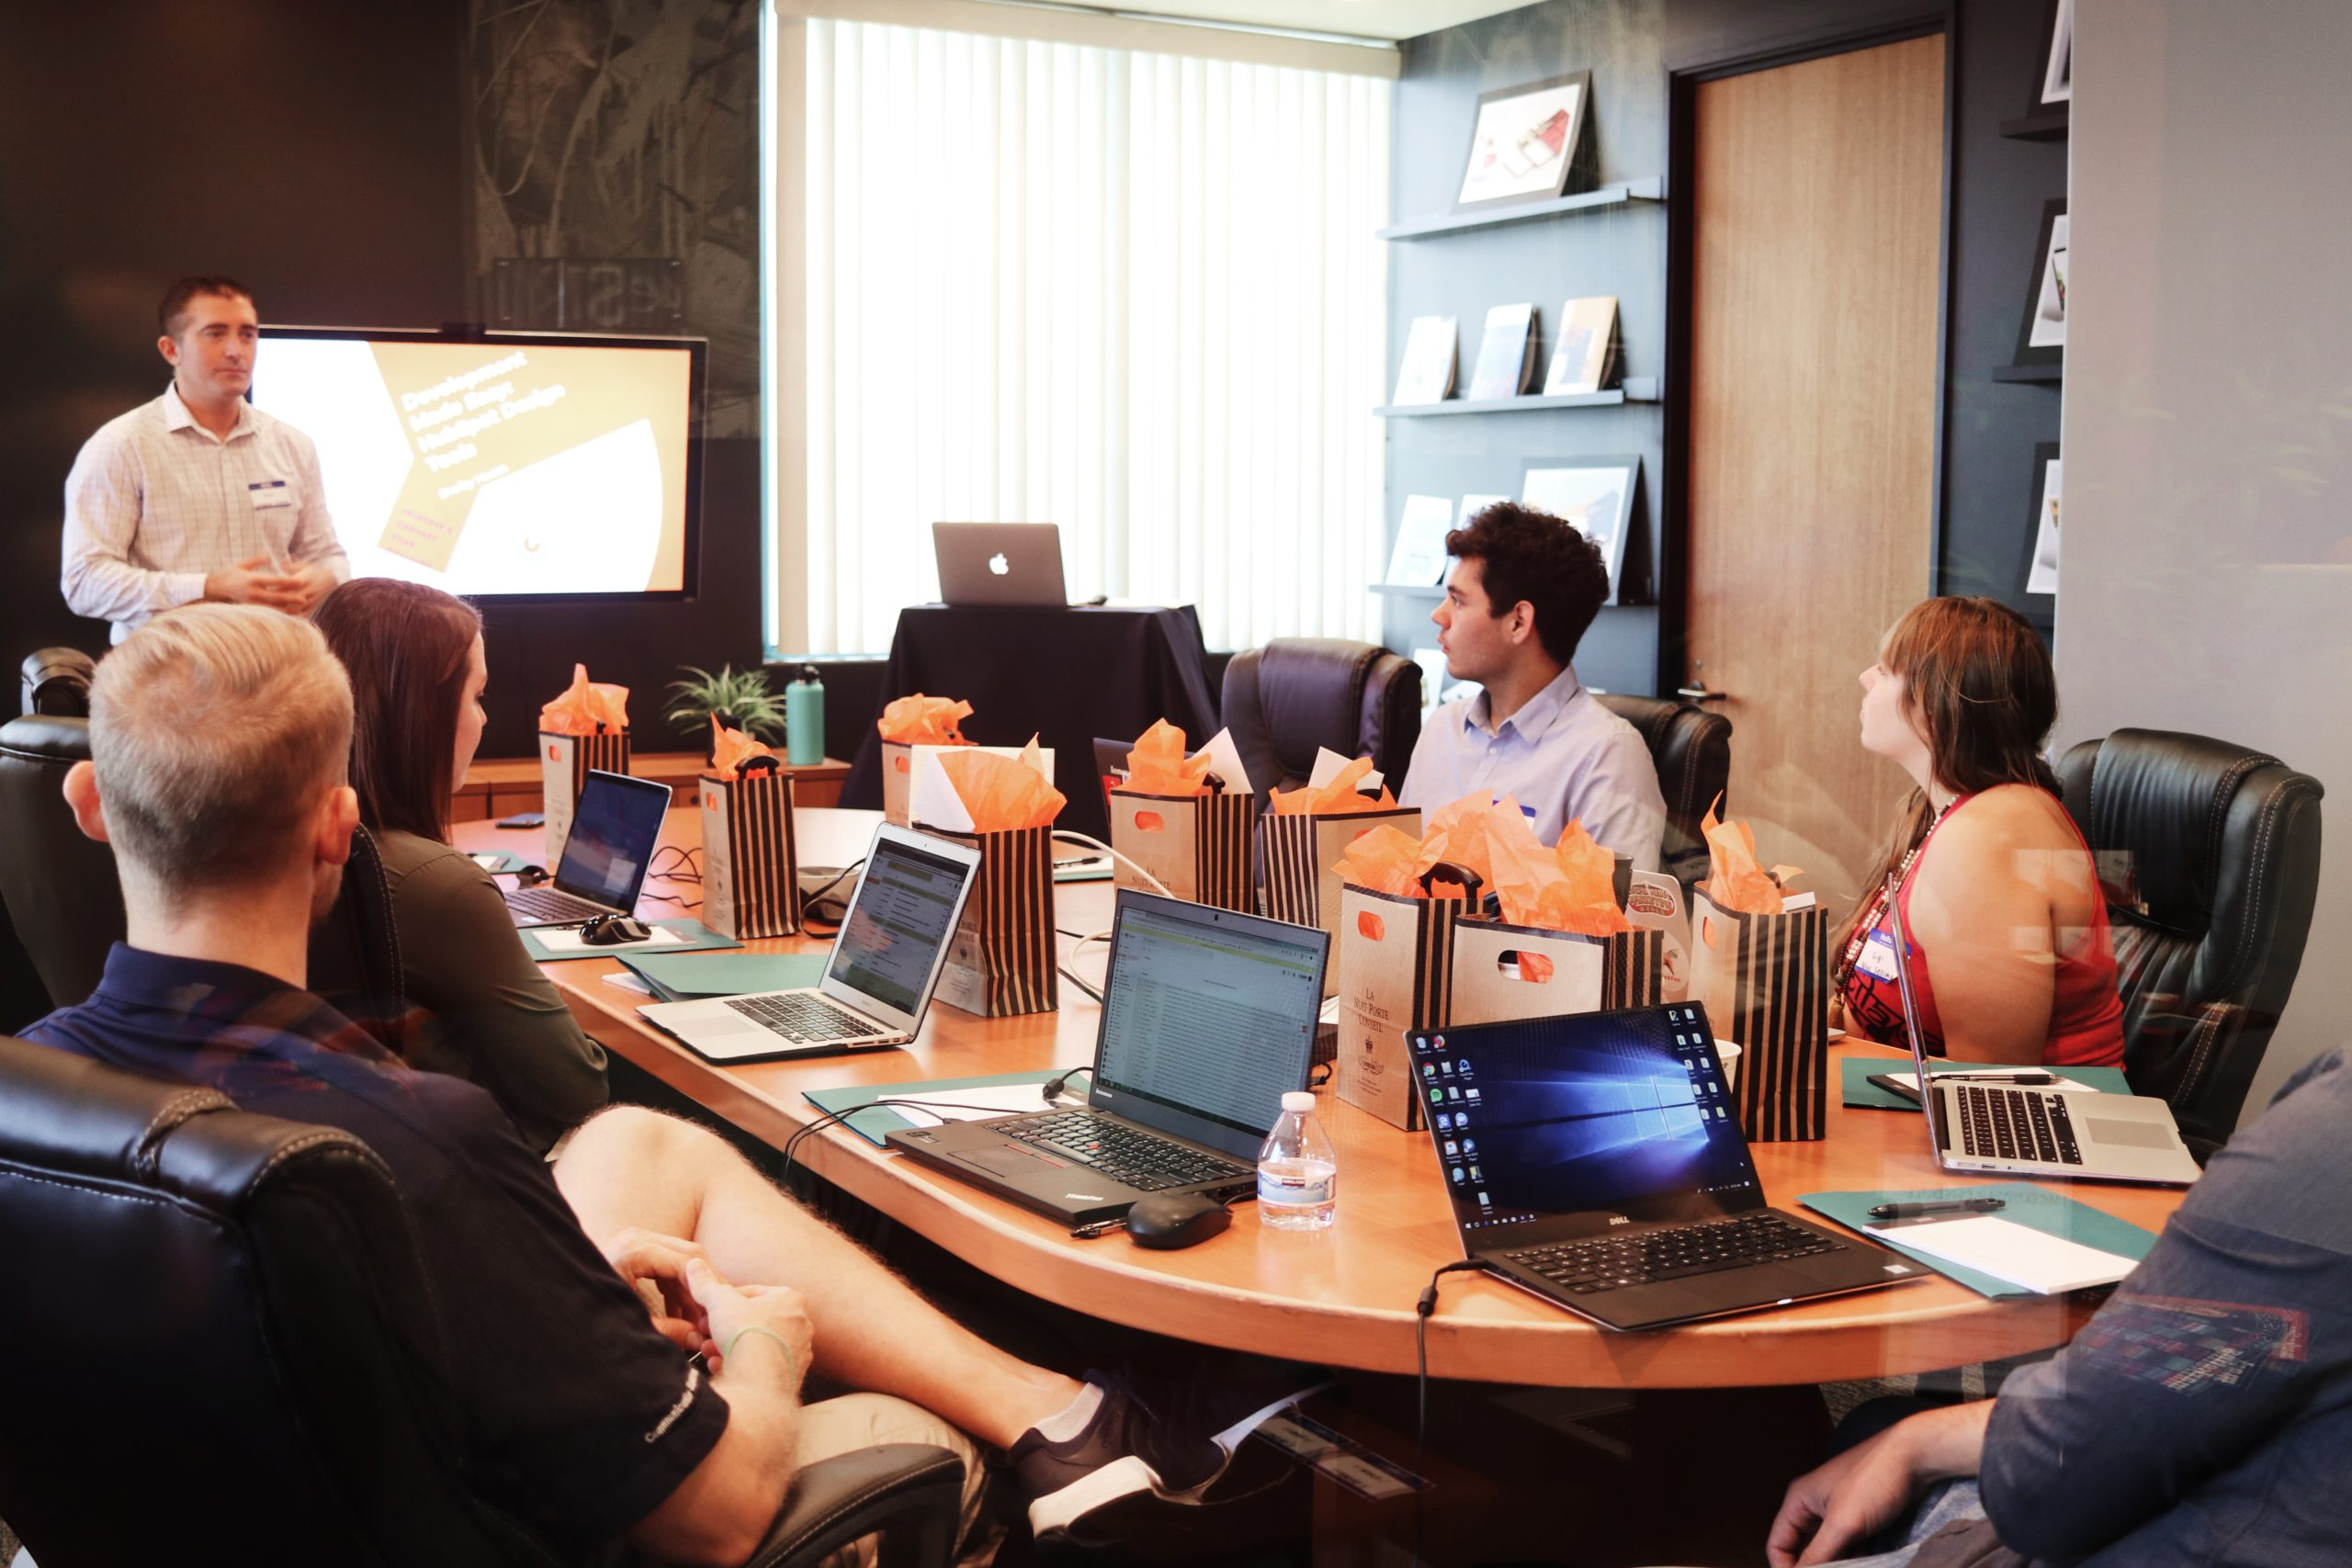 Employee retention strategies to drive organizational success